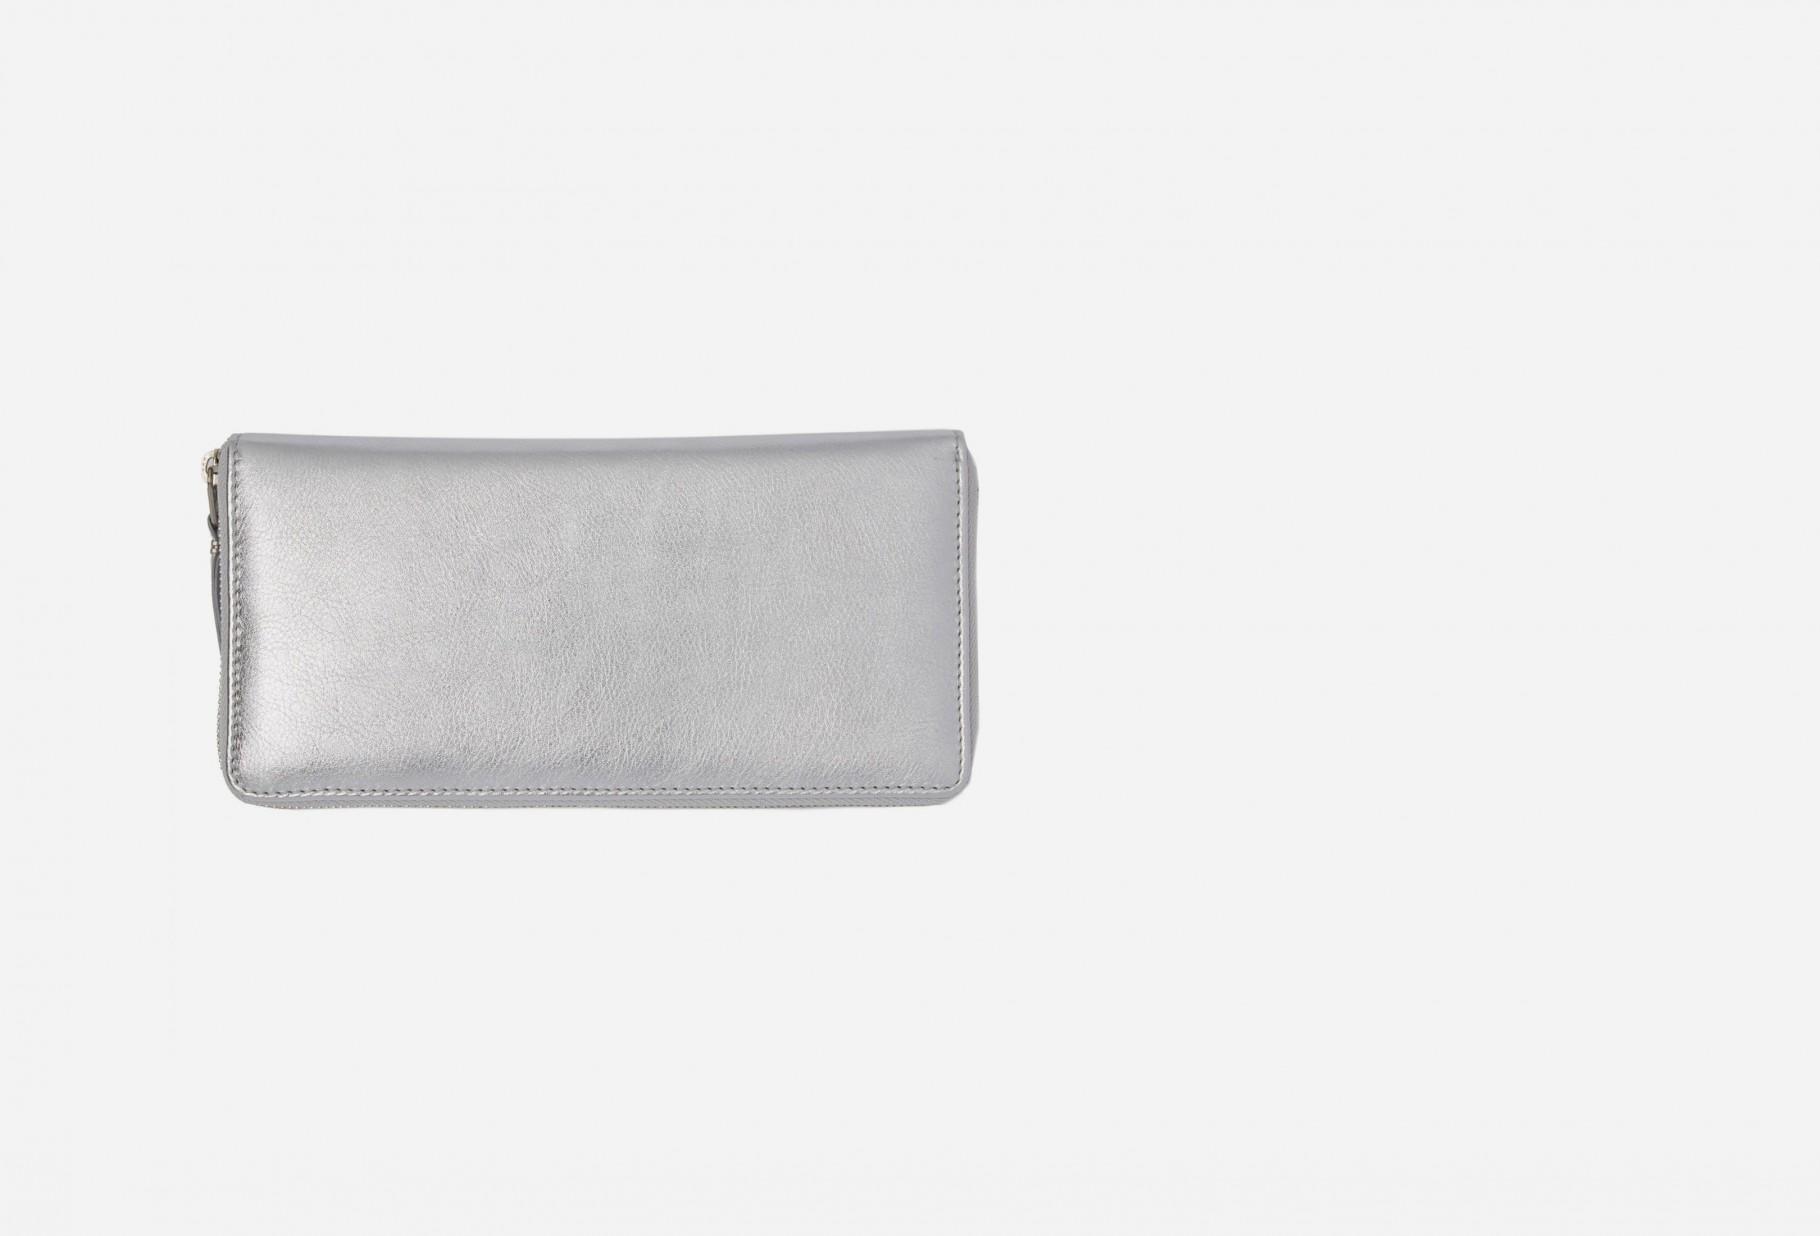 CDG WALLETS FOR WOMAN / Cdg silver wallet sa0110g Silver